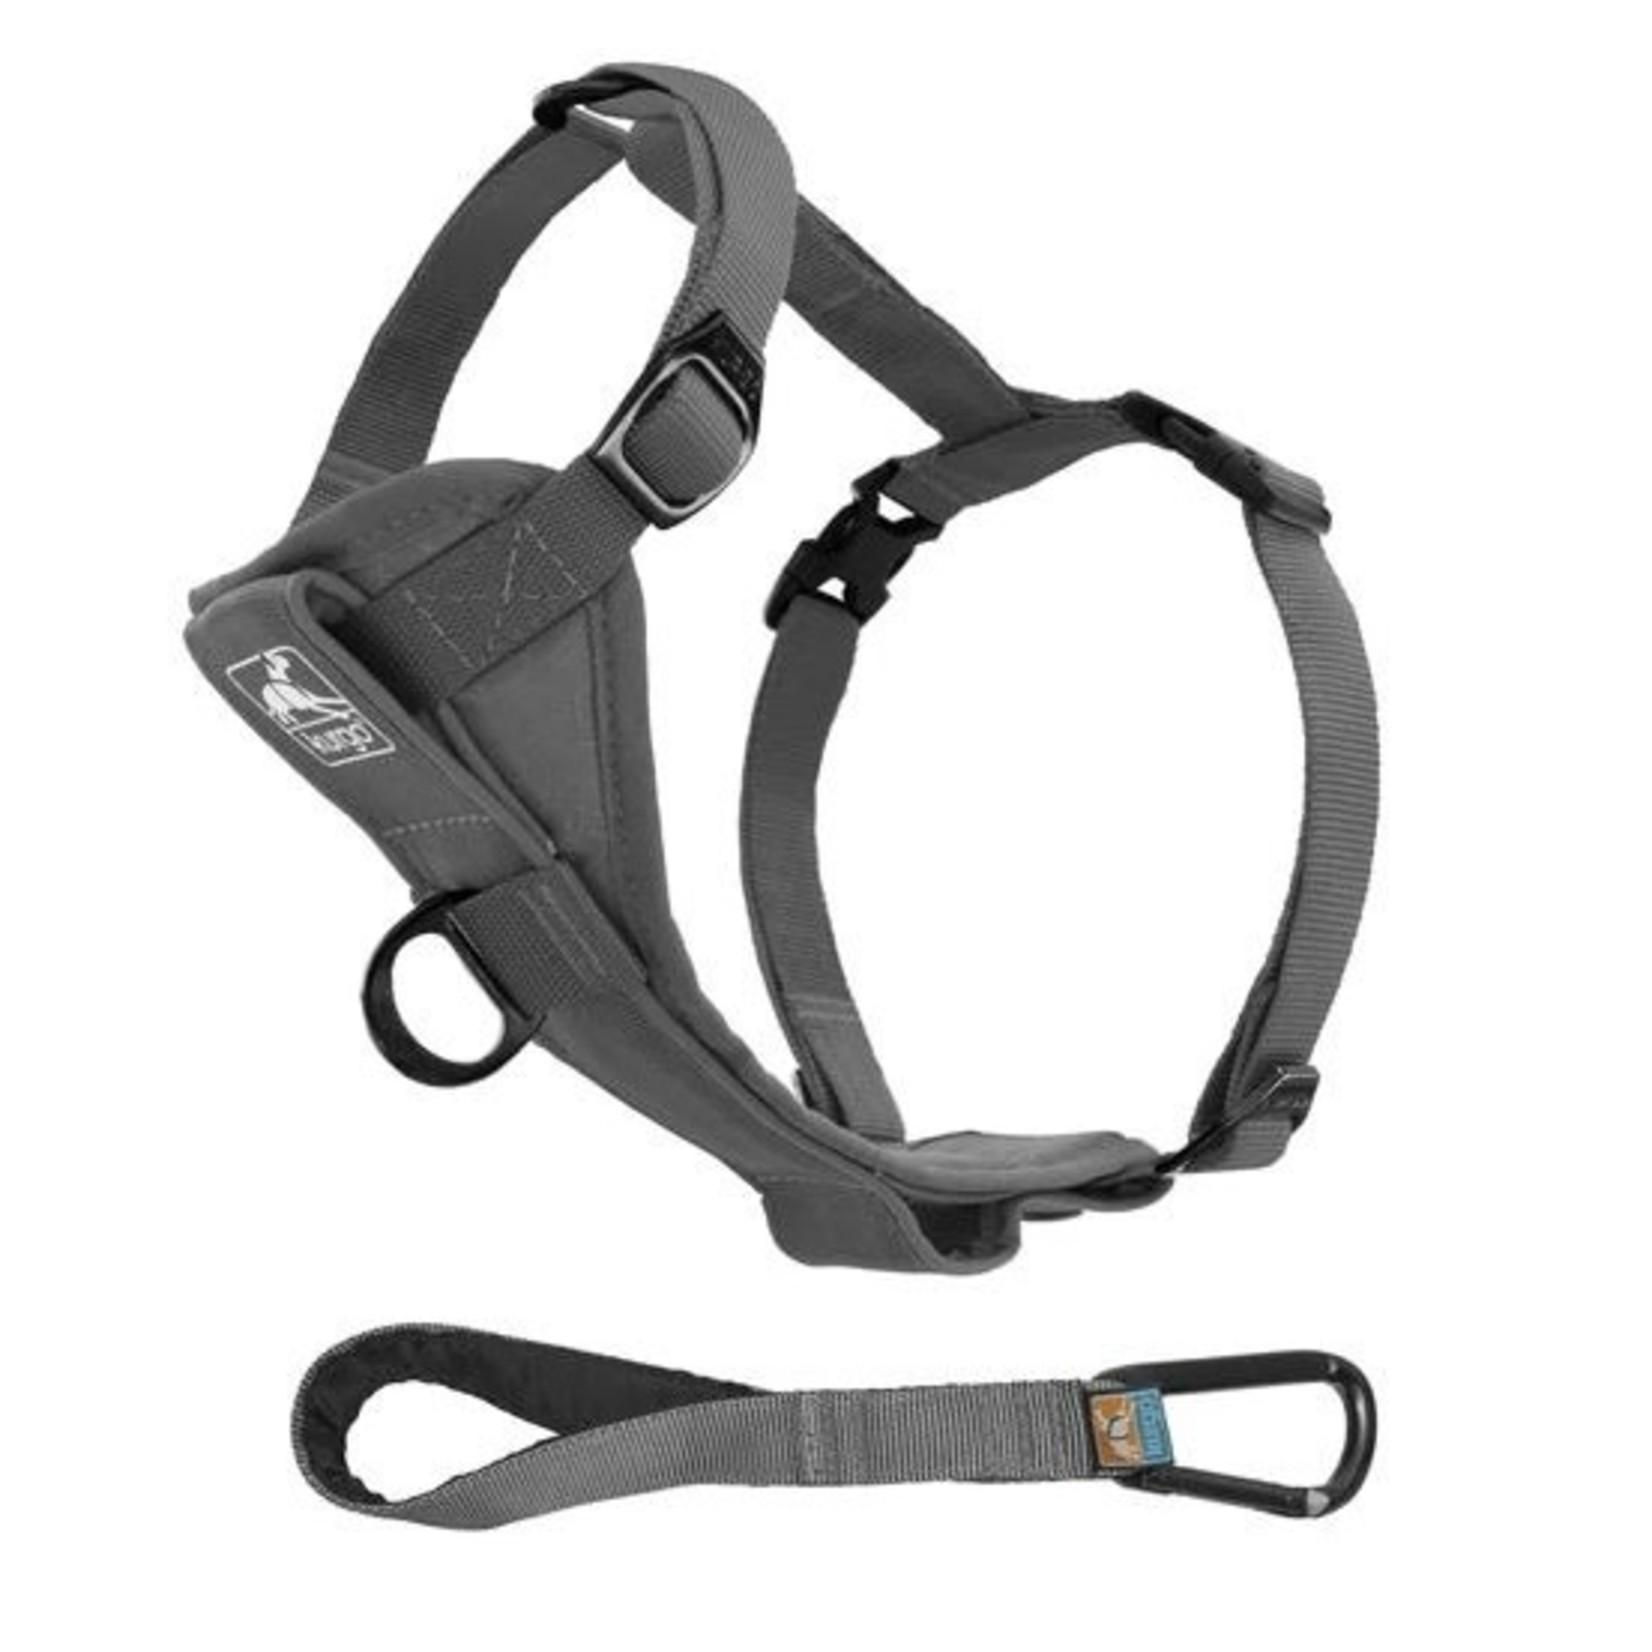 Kurgo Kurgo Harness Tru-Fit Smart Grey L